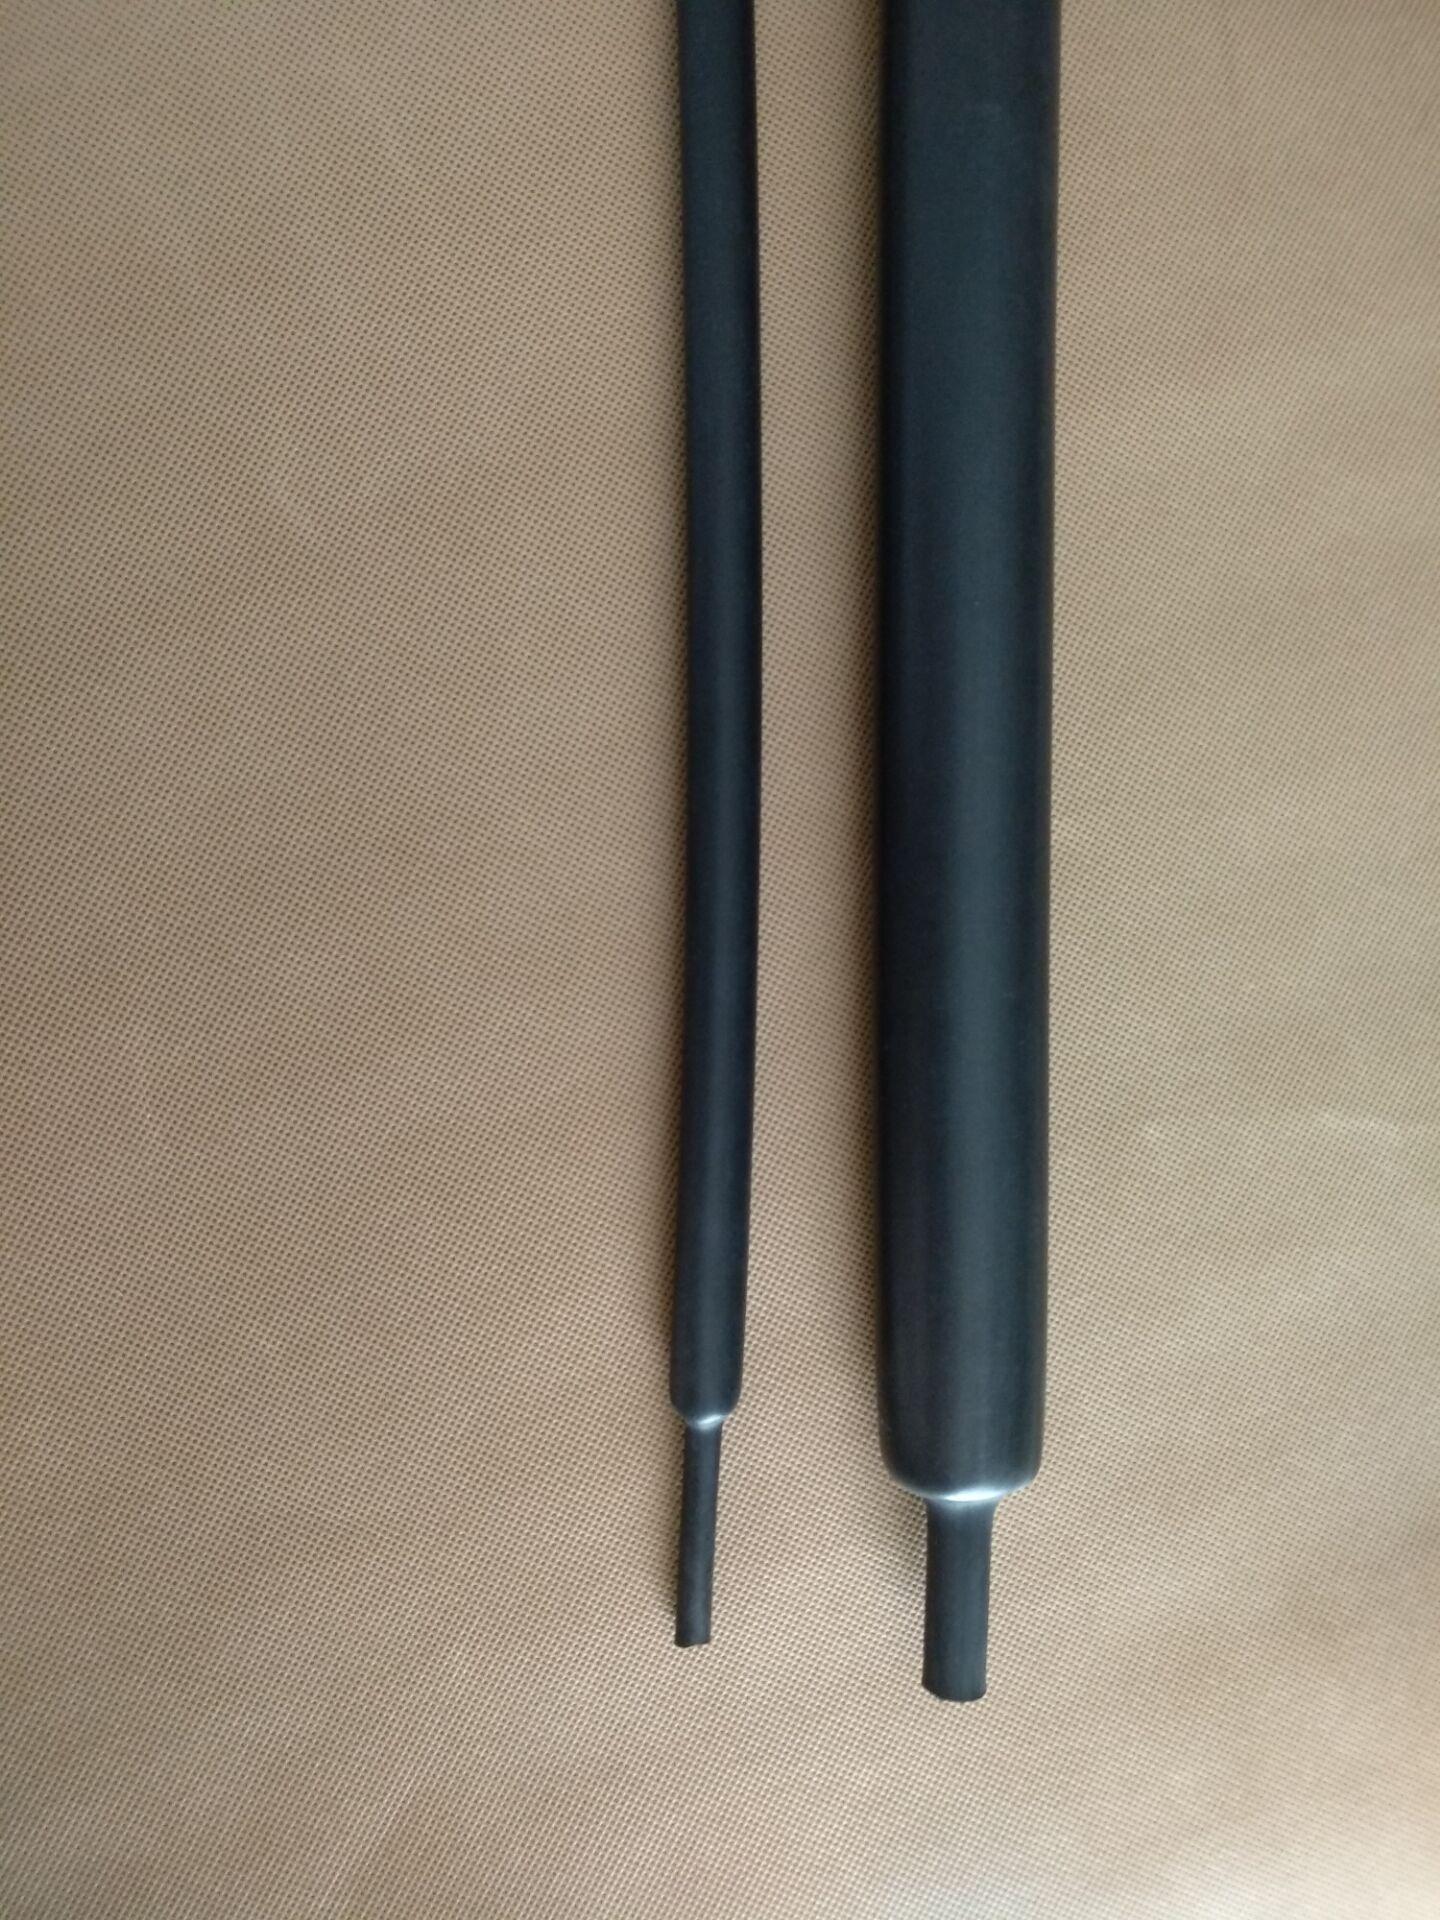 3-180MM電纜密封防水4倍5倍收縮帶膠厚壁護套熱縮管 3